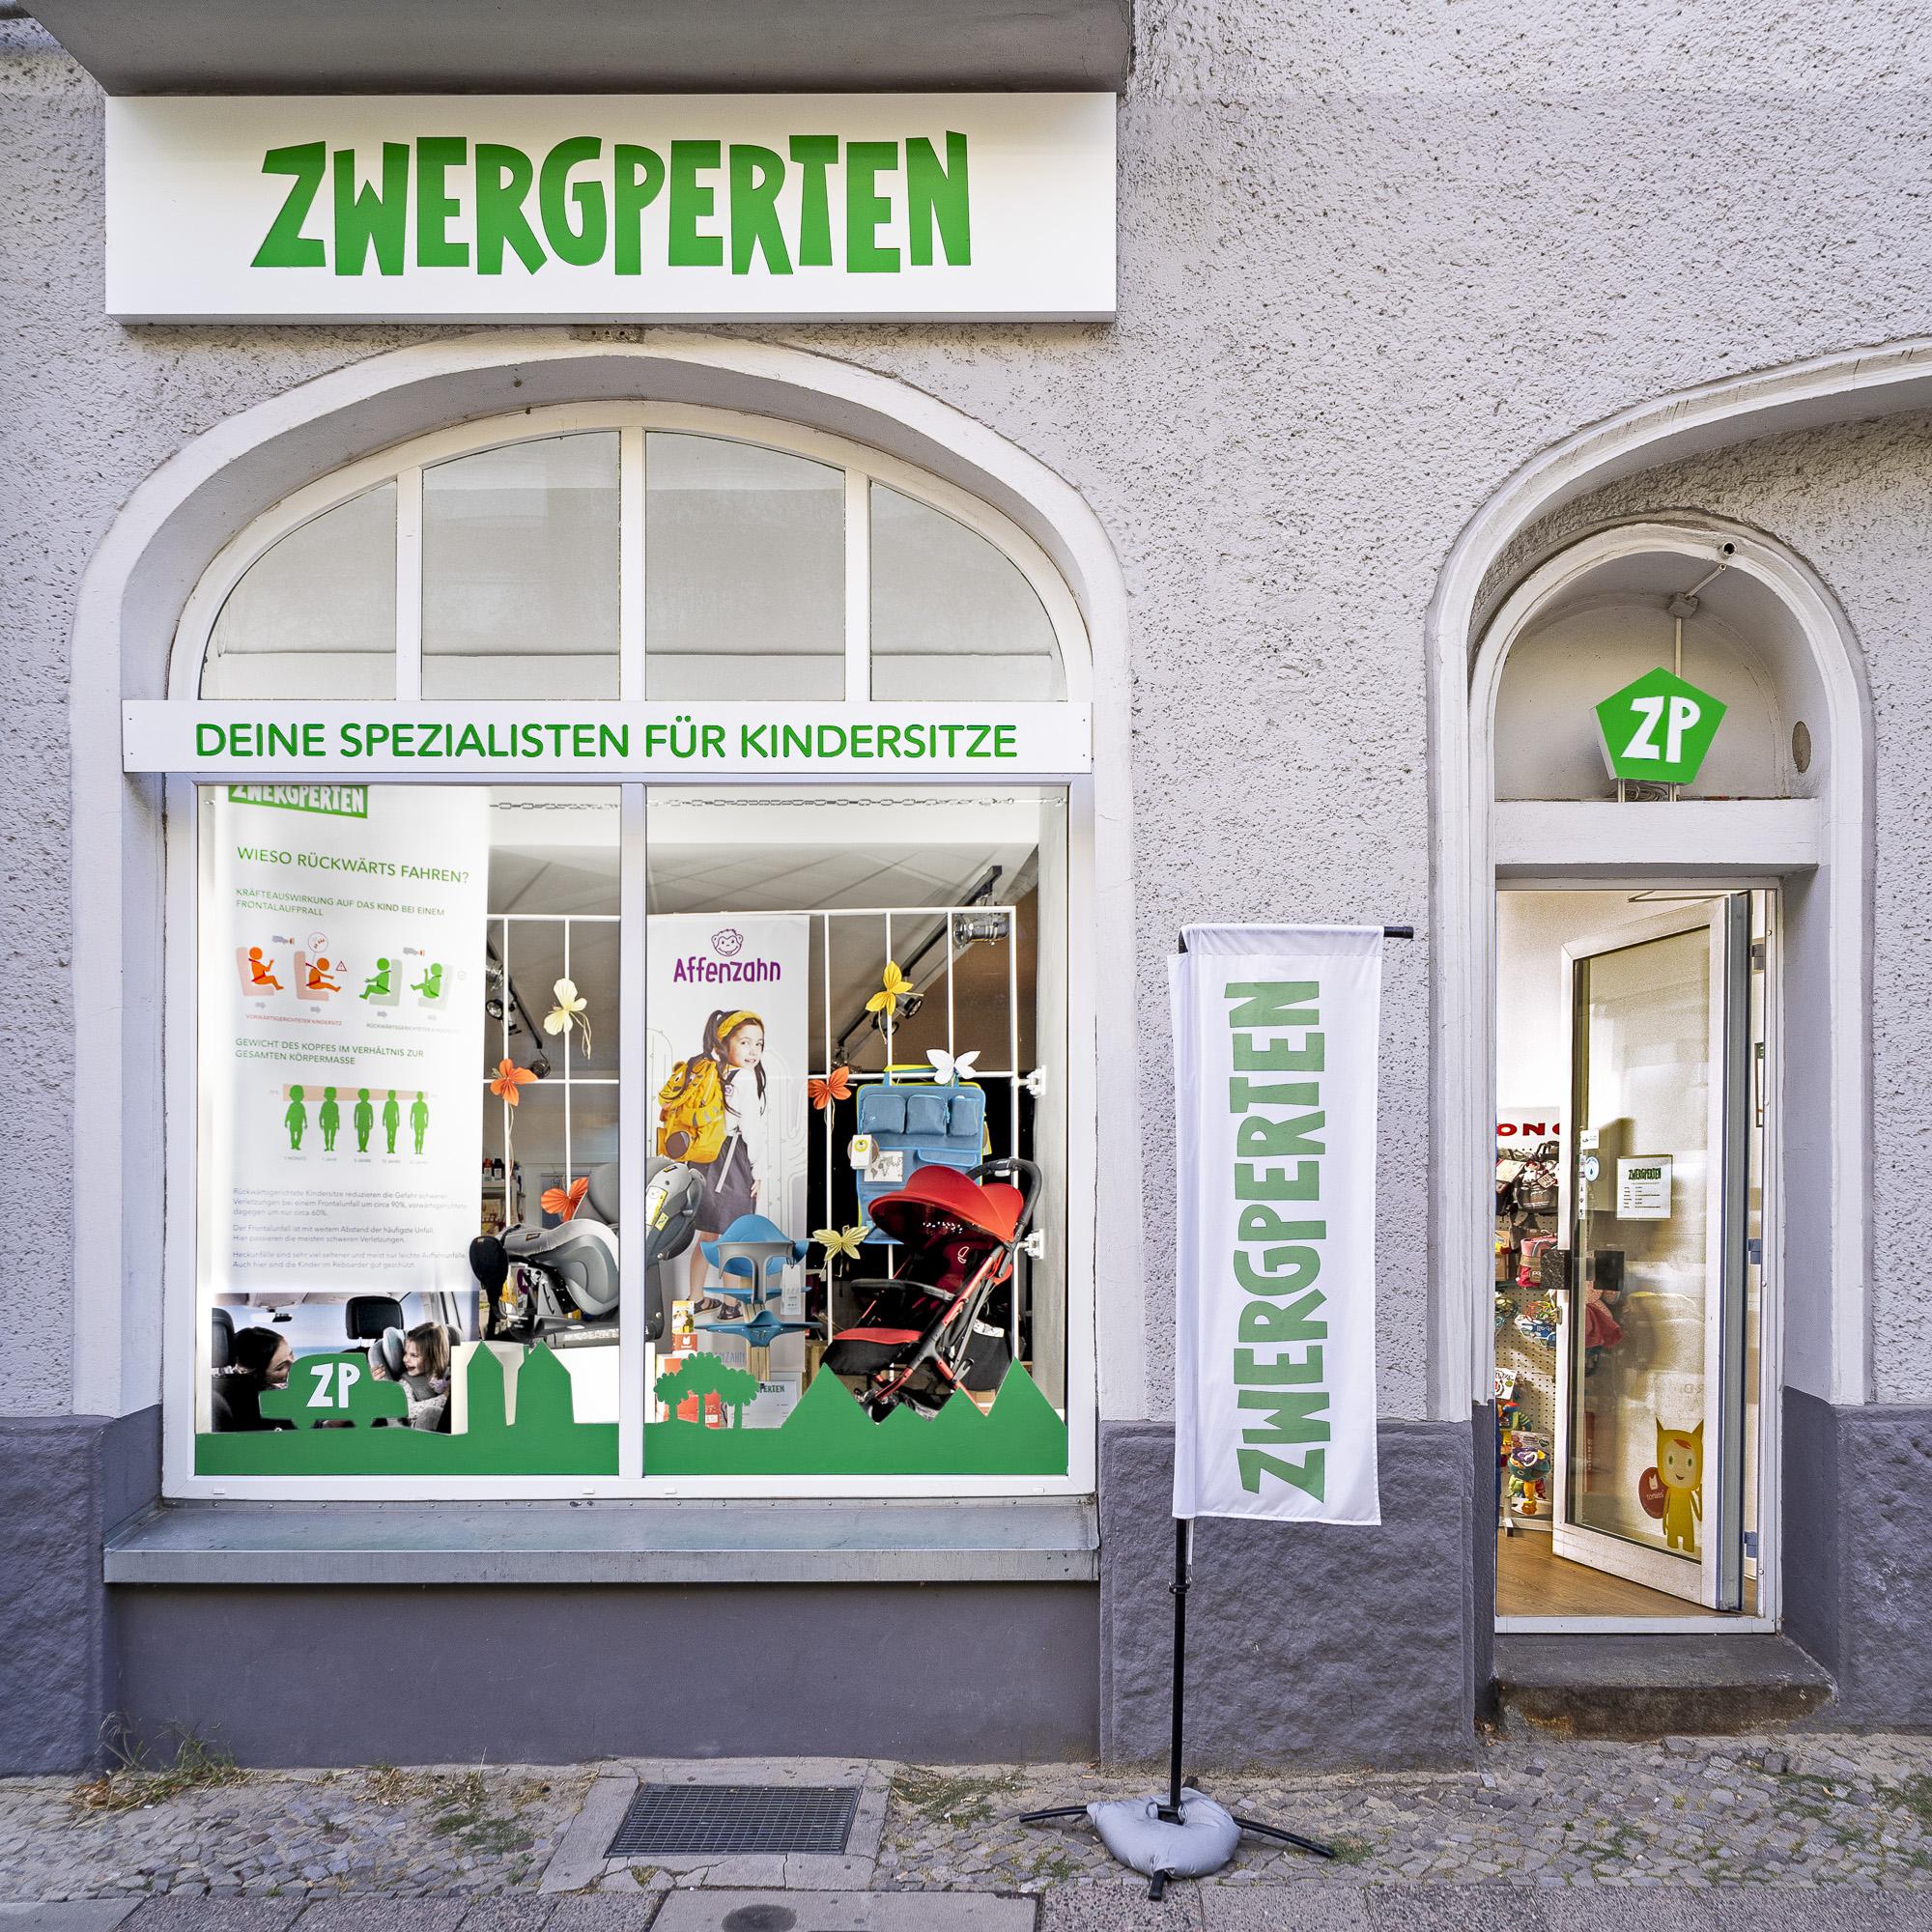 ZWERGPERTEN® Berlin